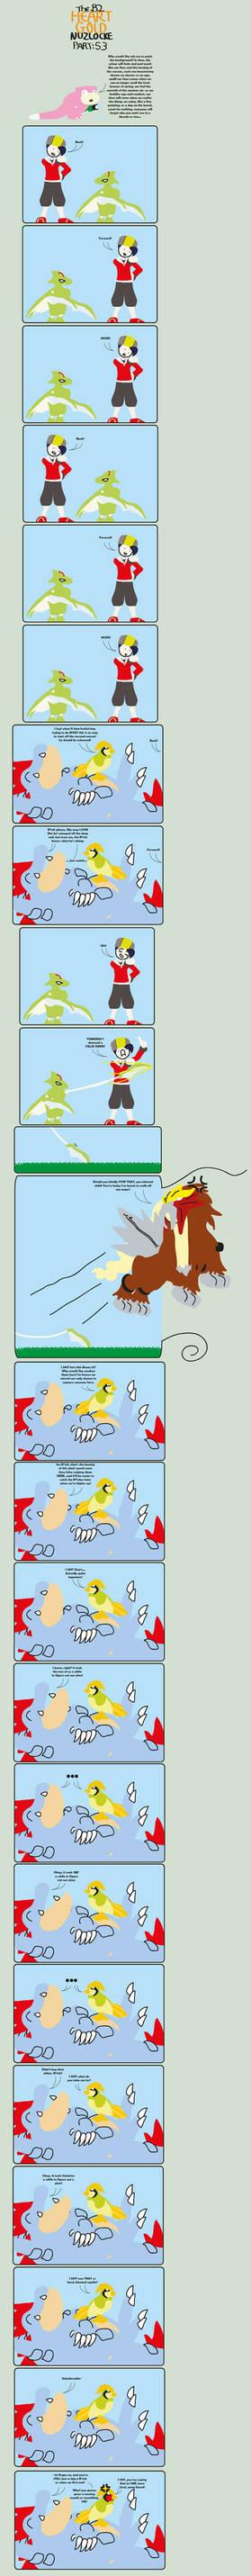 HG Nuzlocke page 53